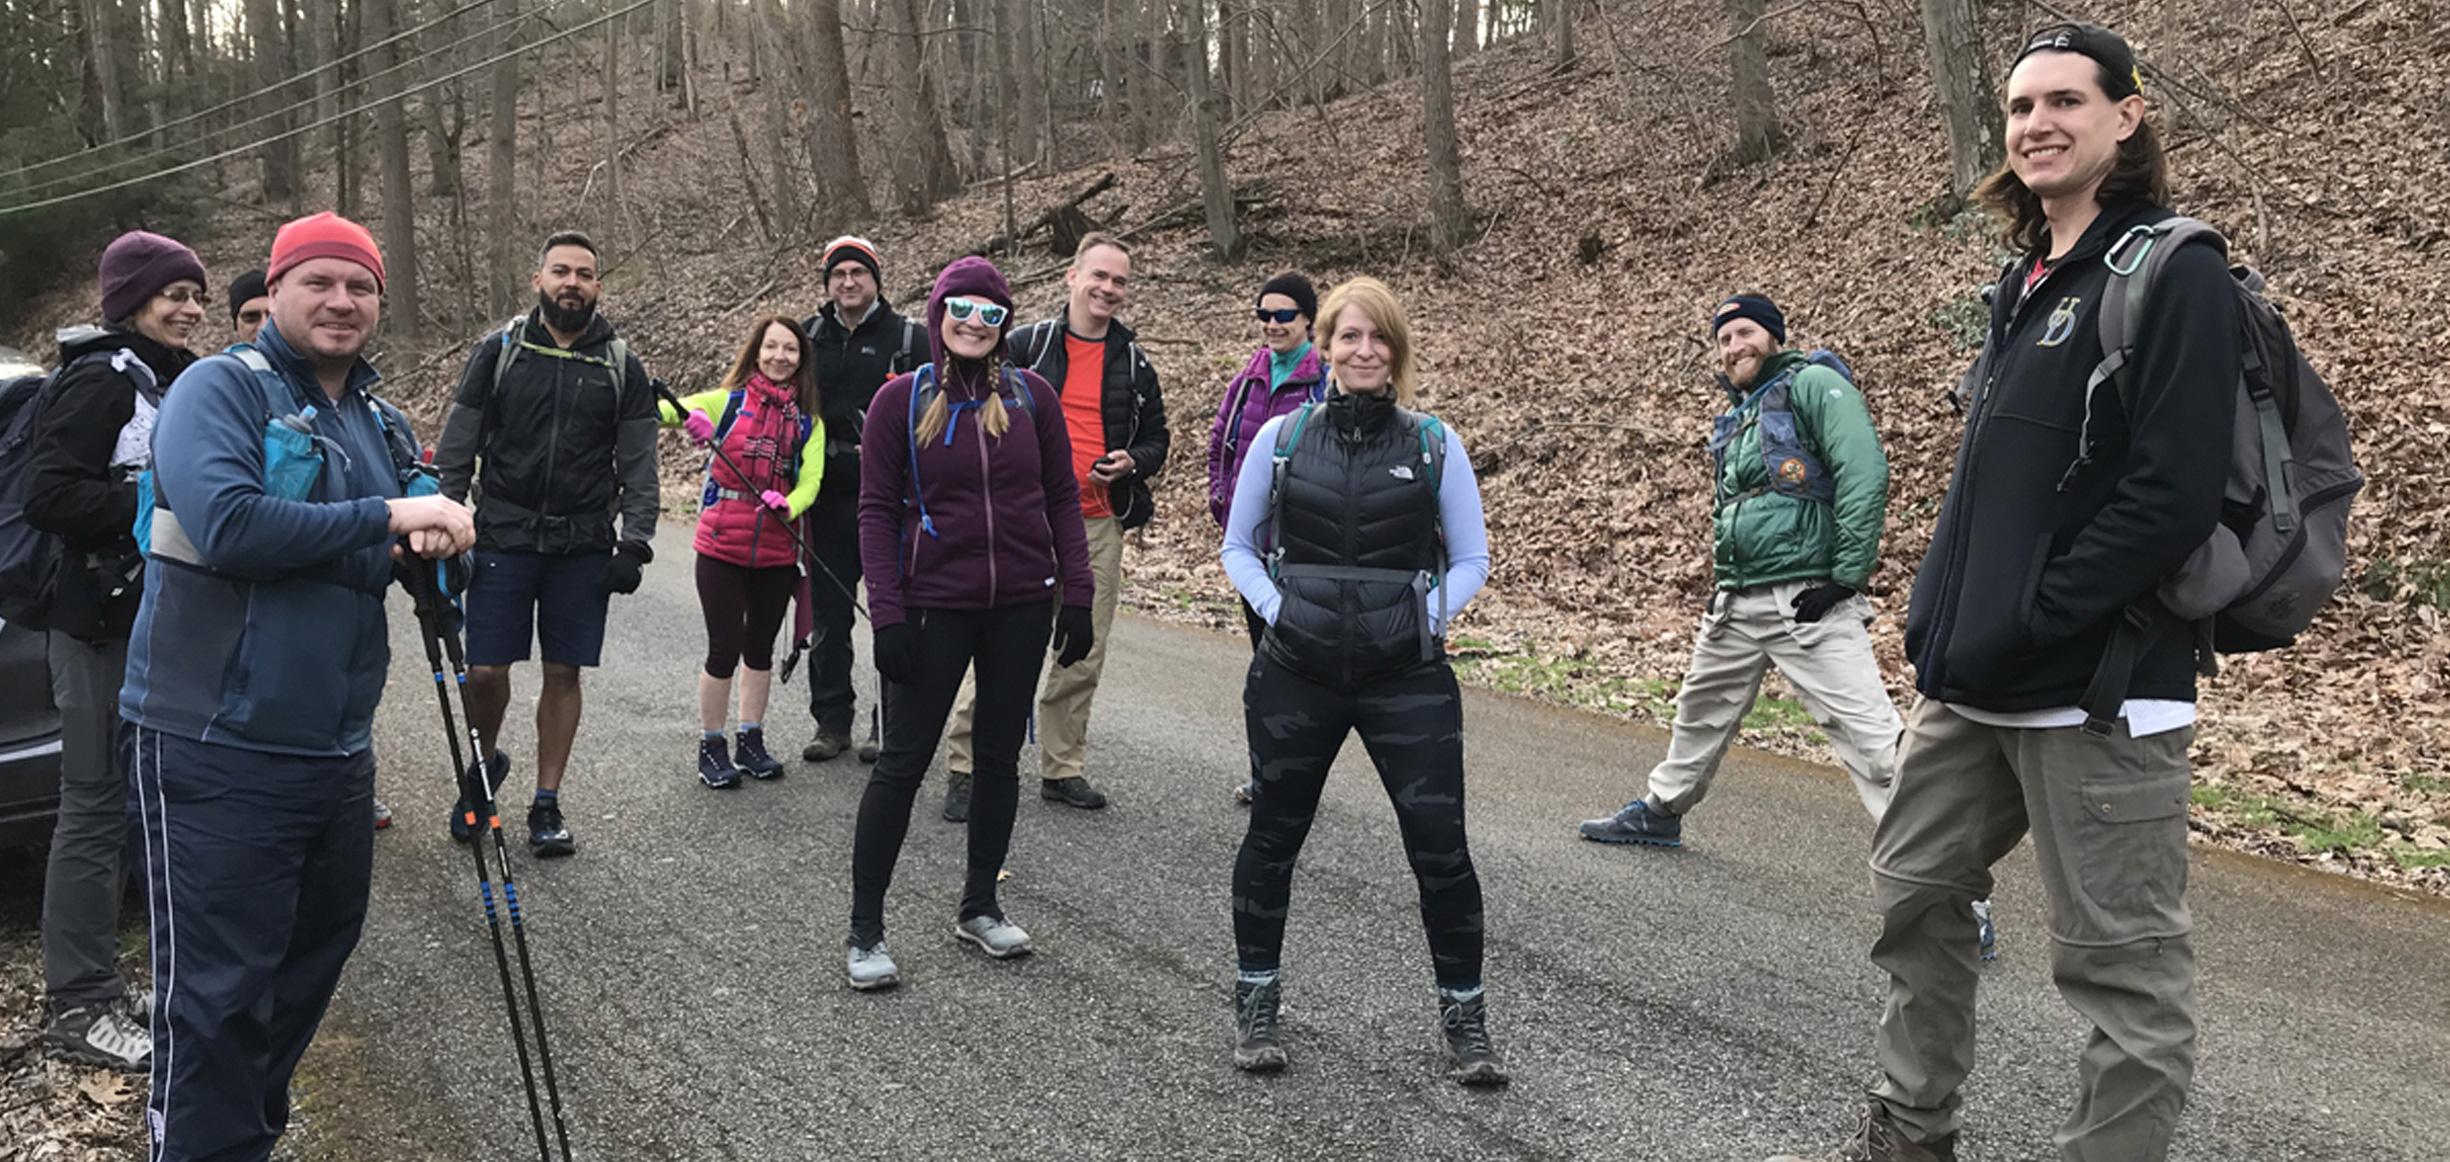 long-distance-hiking-group-along-susquehanna